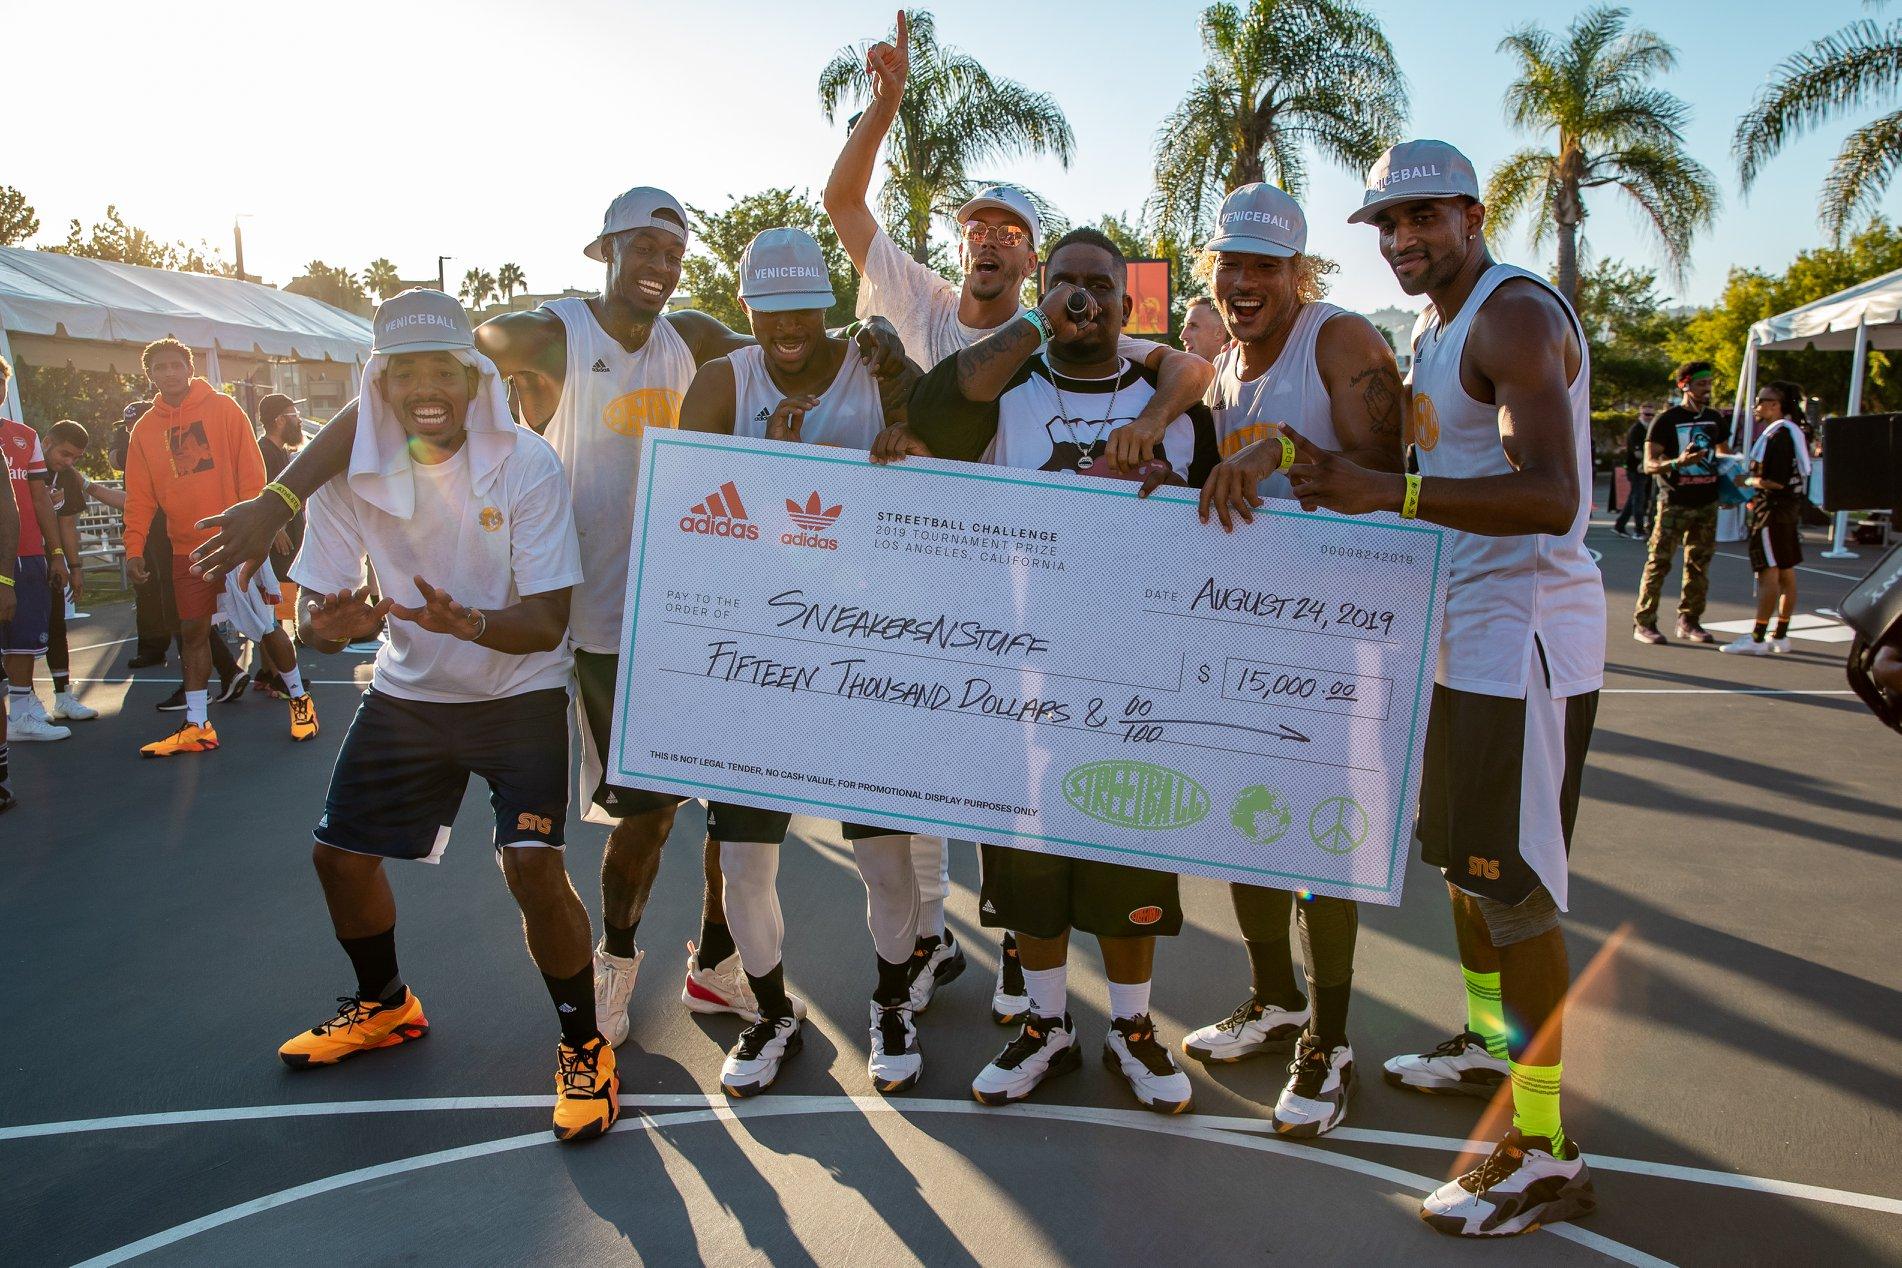 VBL x SNS Takeover Adidas Streetball challenge